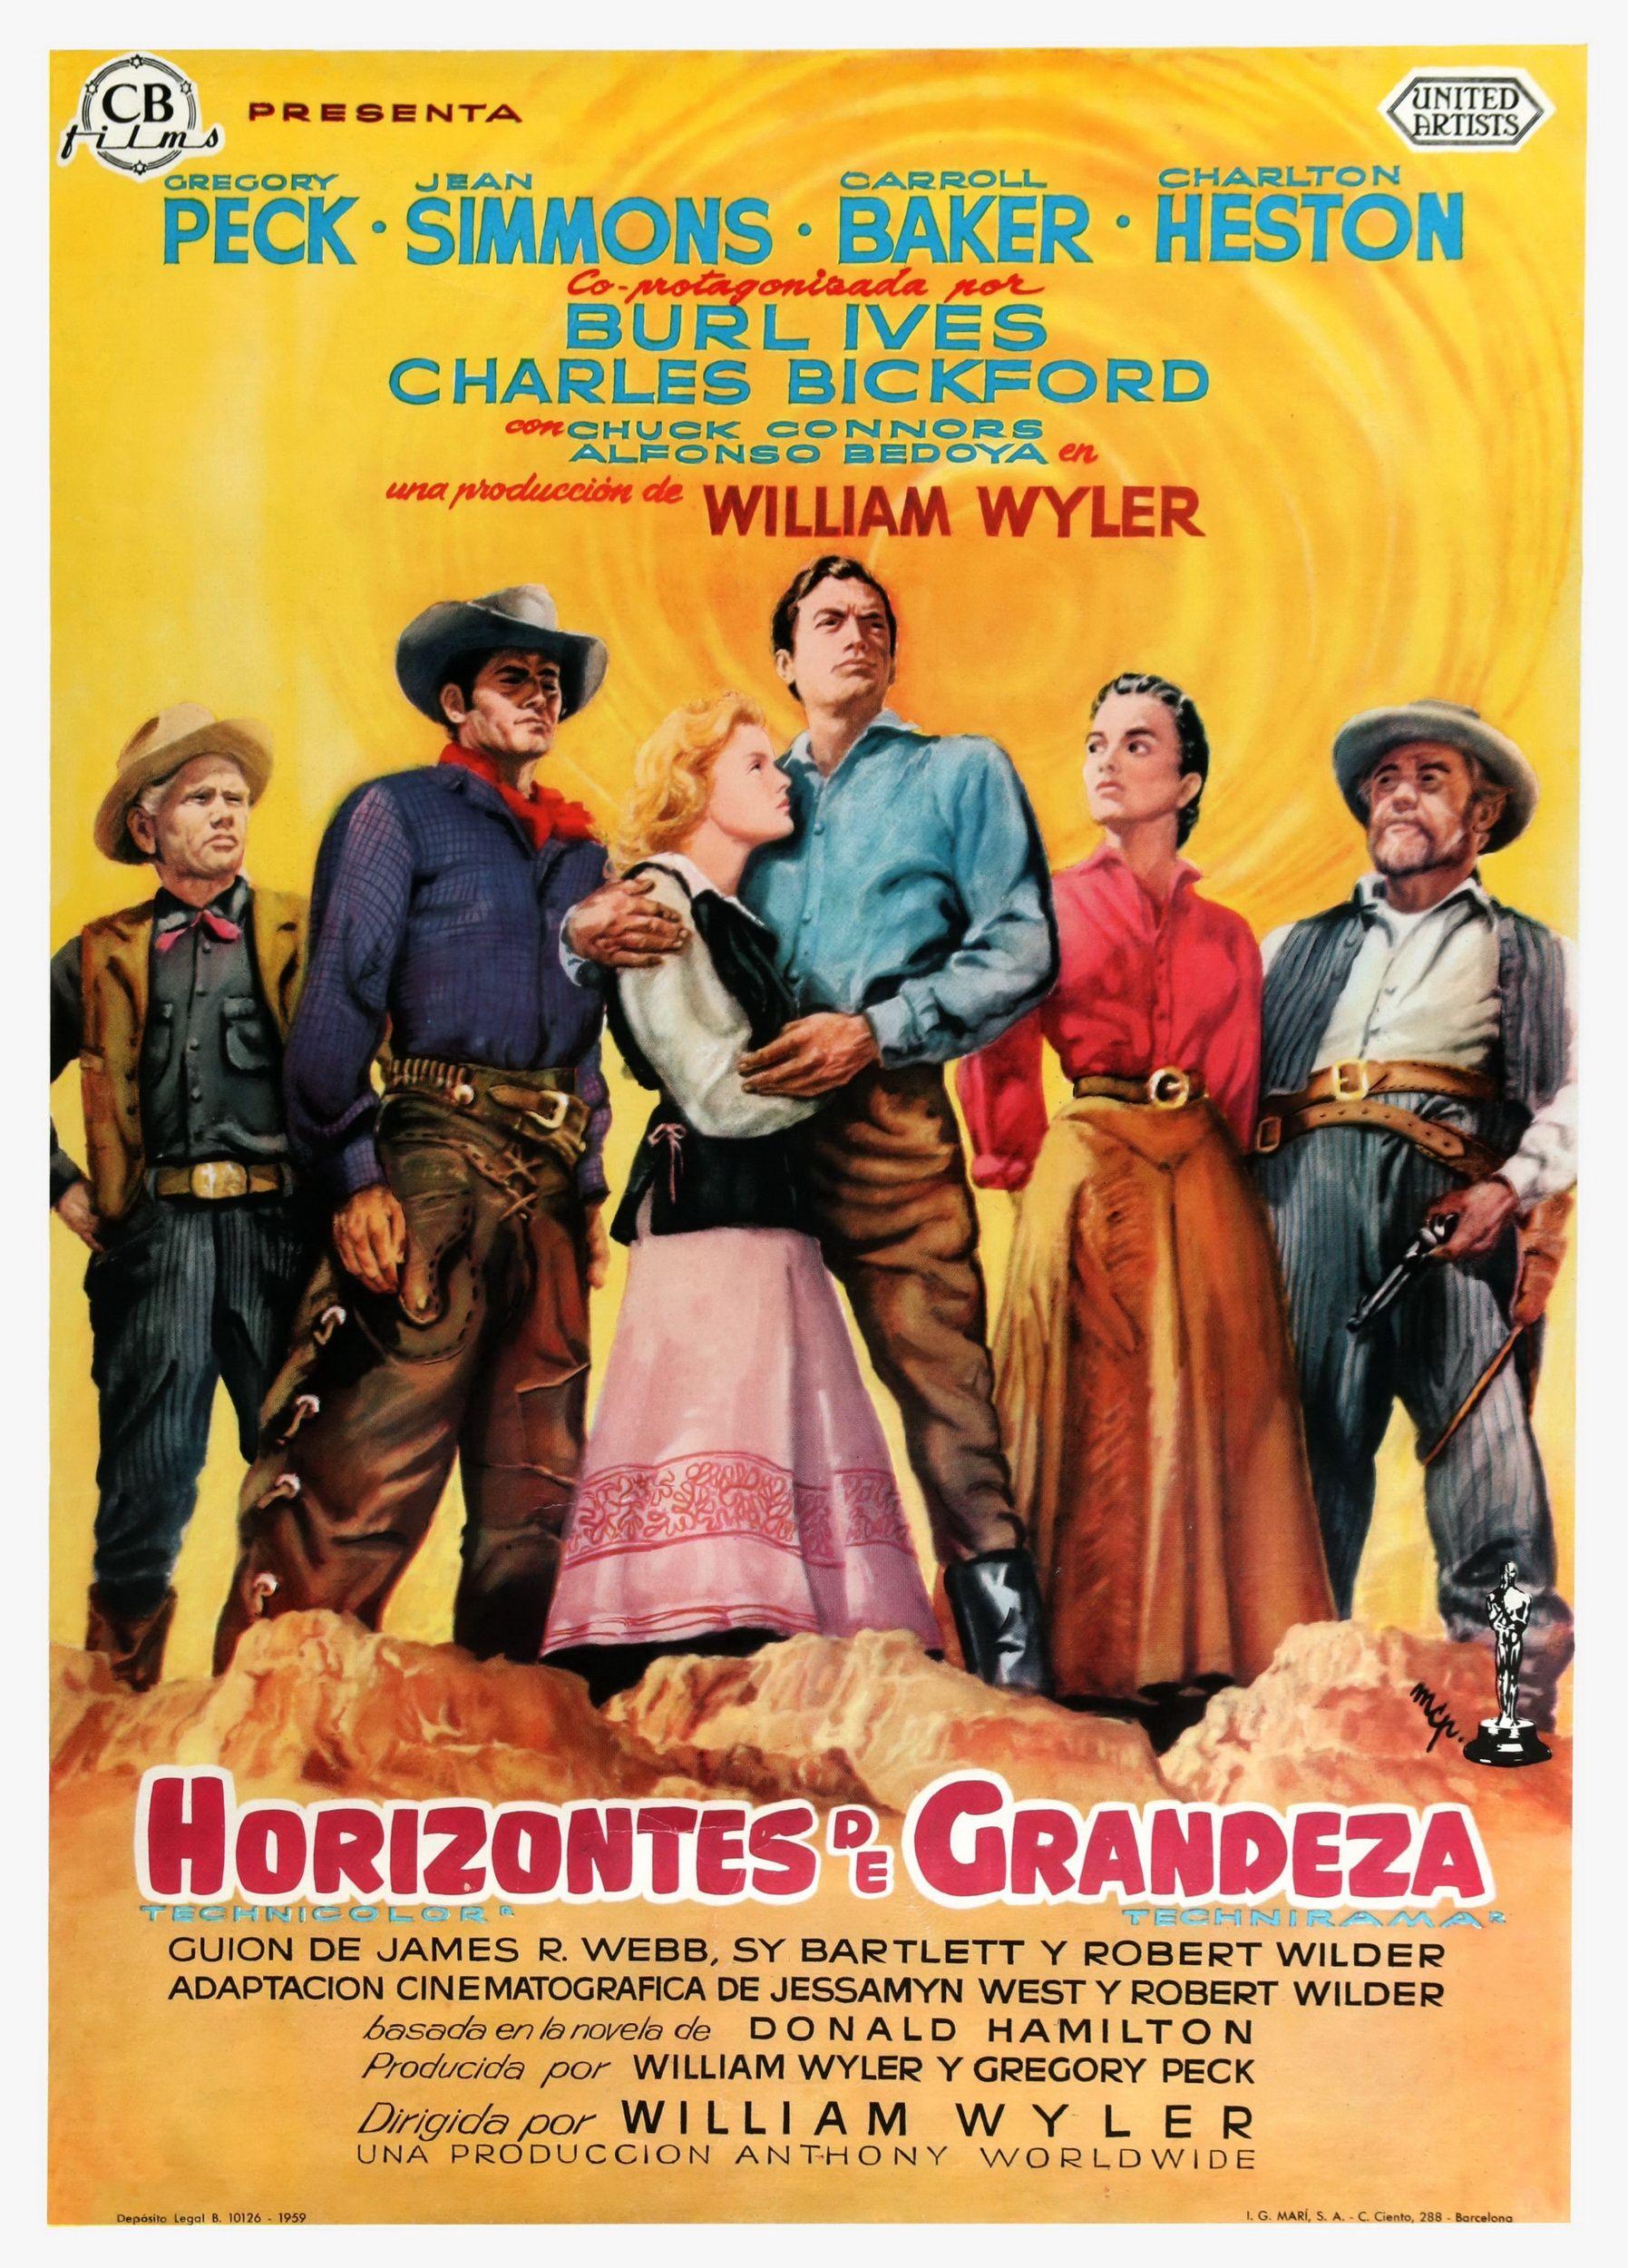 Horizontes De Grandeza Programa De Cine Cine Carteleras De Cine